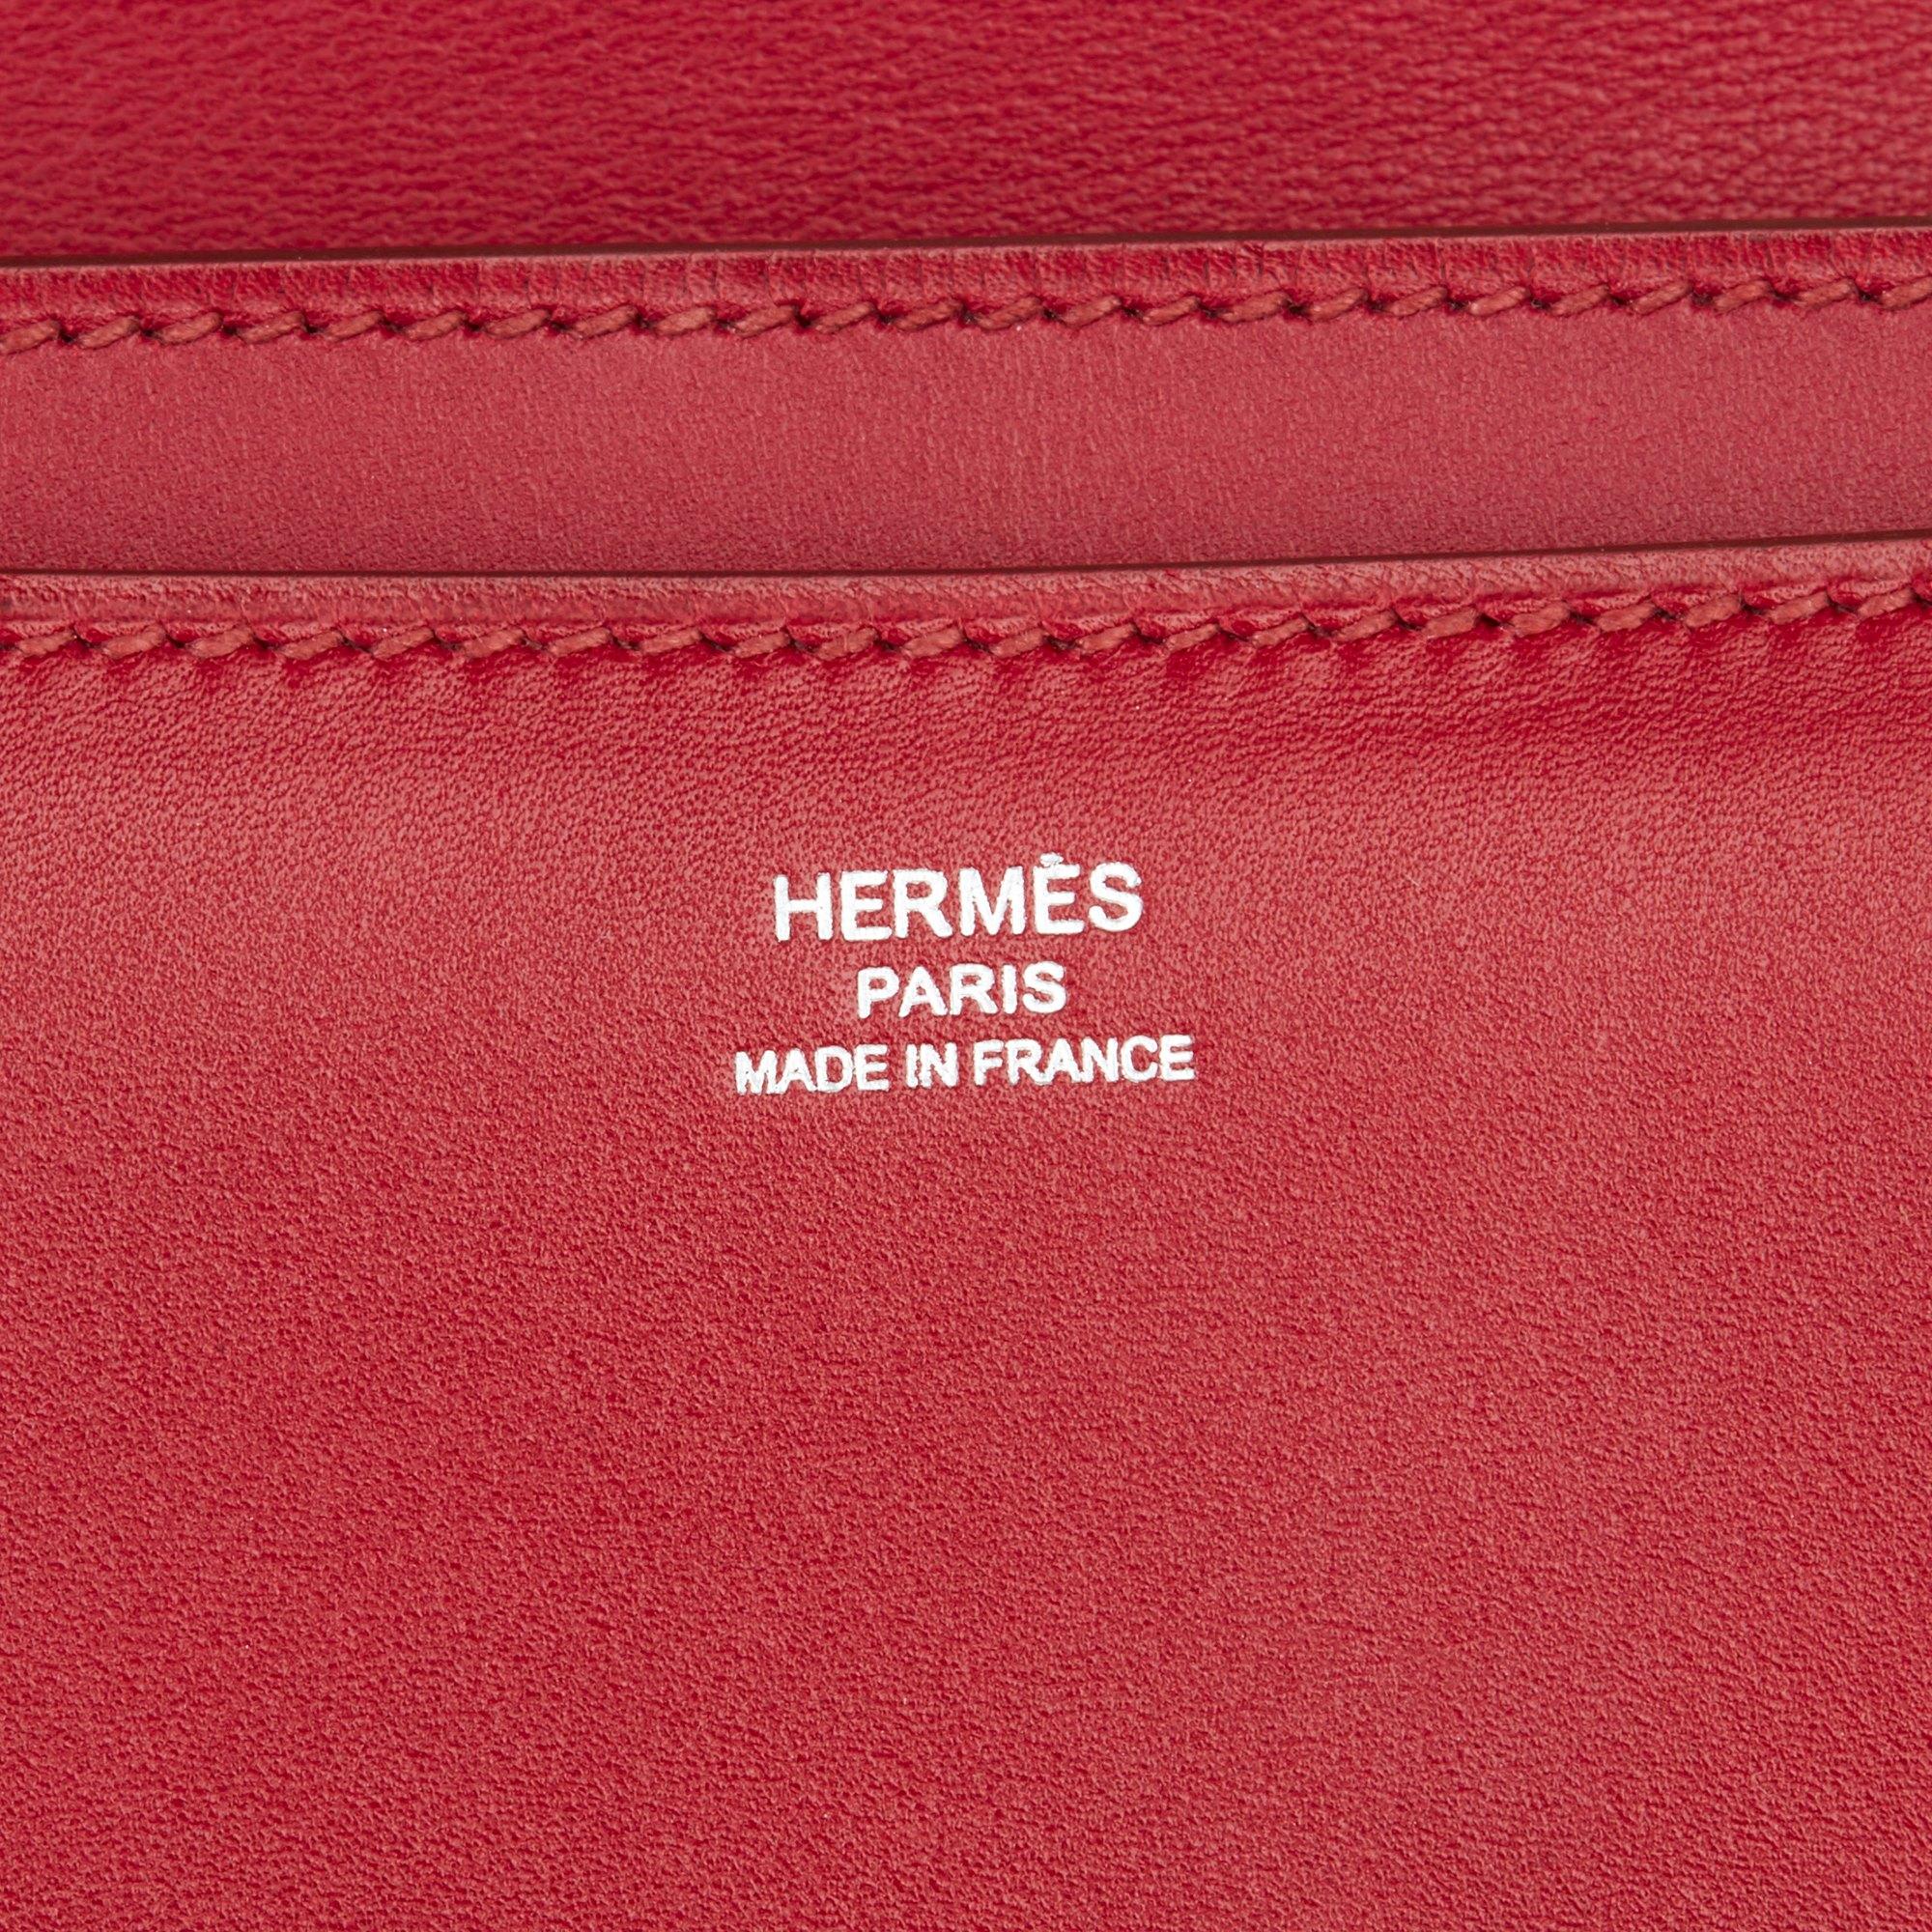 Hermès Rubis Tadelakt Leather Constance Elan